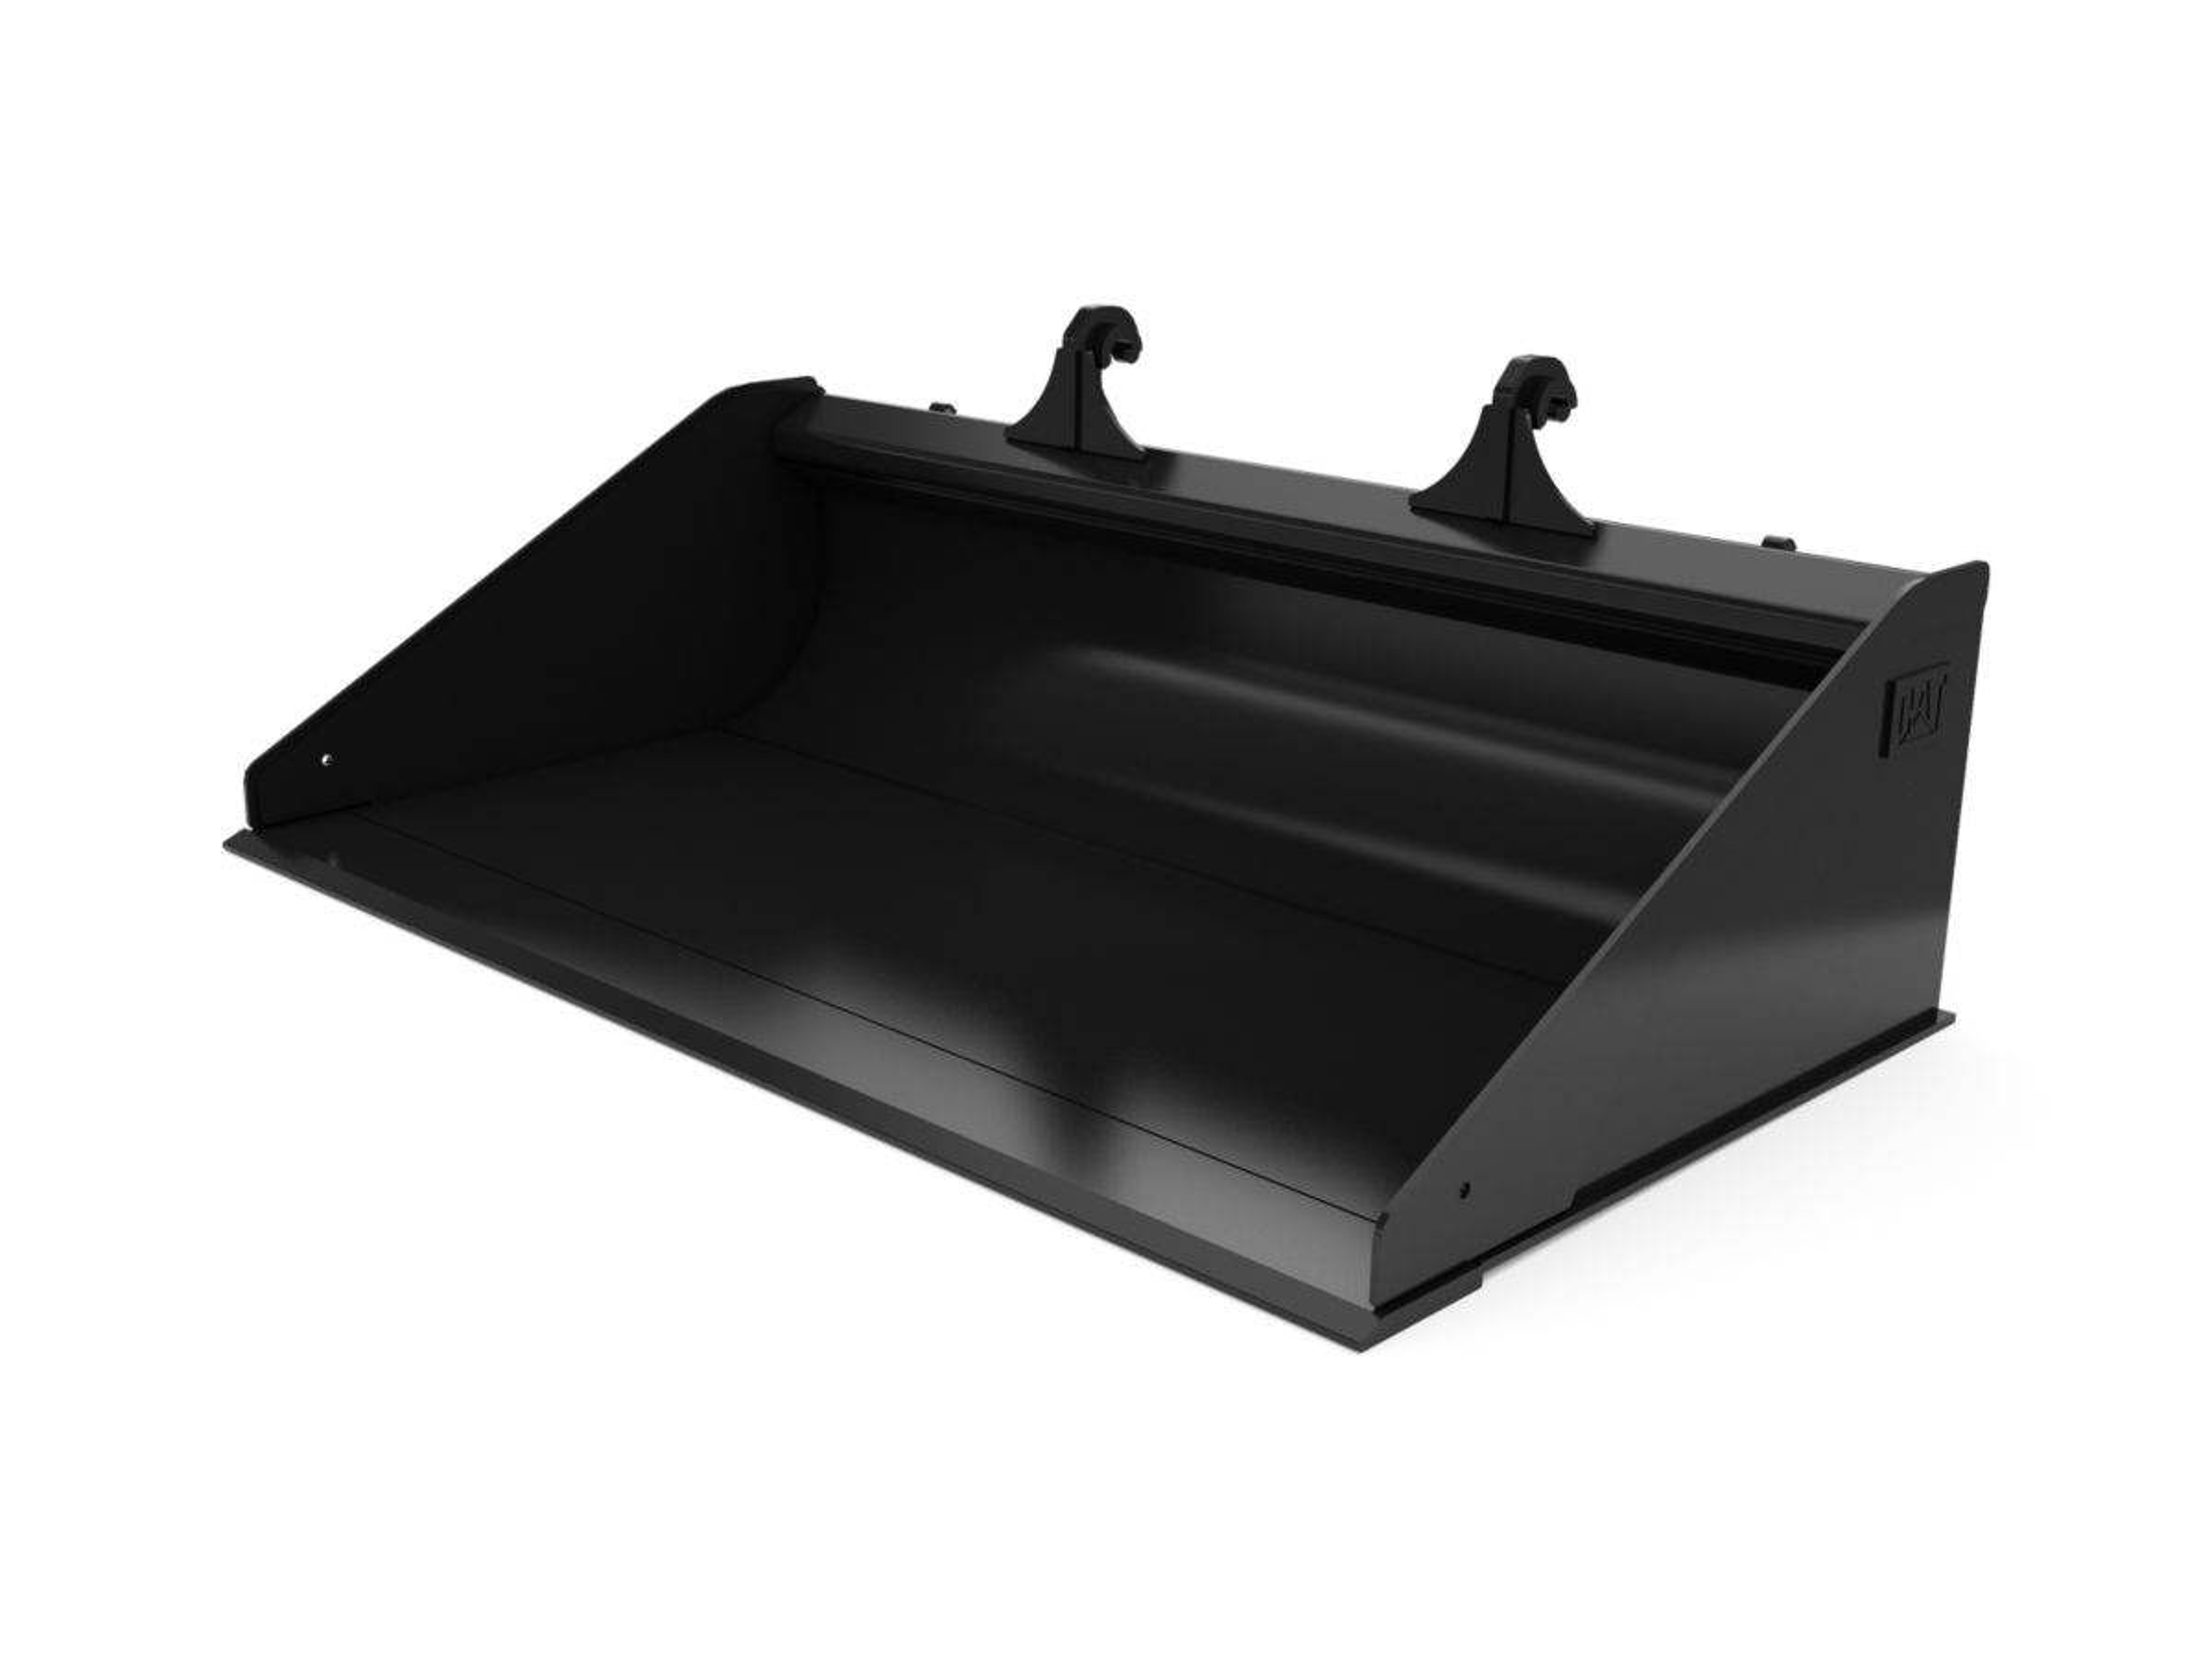 1.9 m3 (2.5 yd3) ISO Coupler Grading Bucket